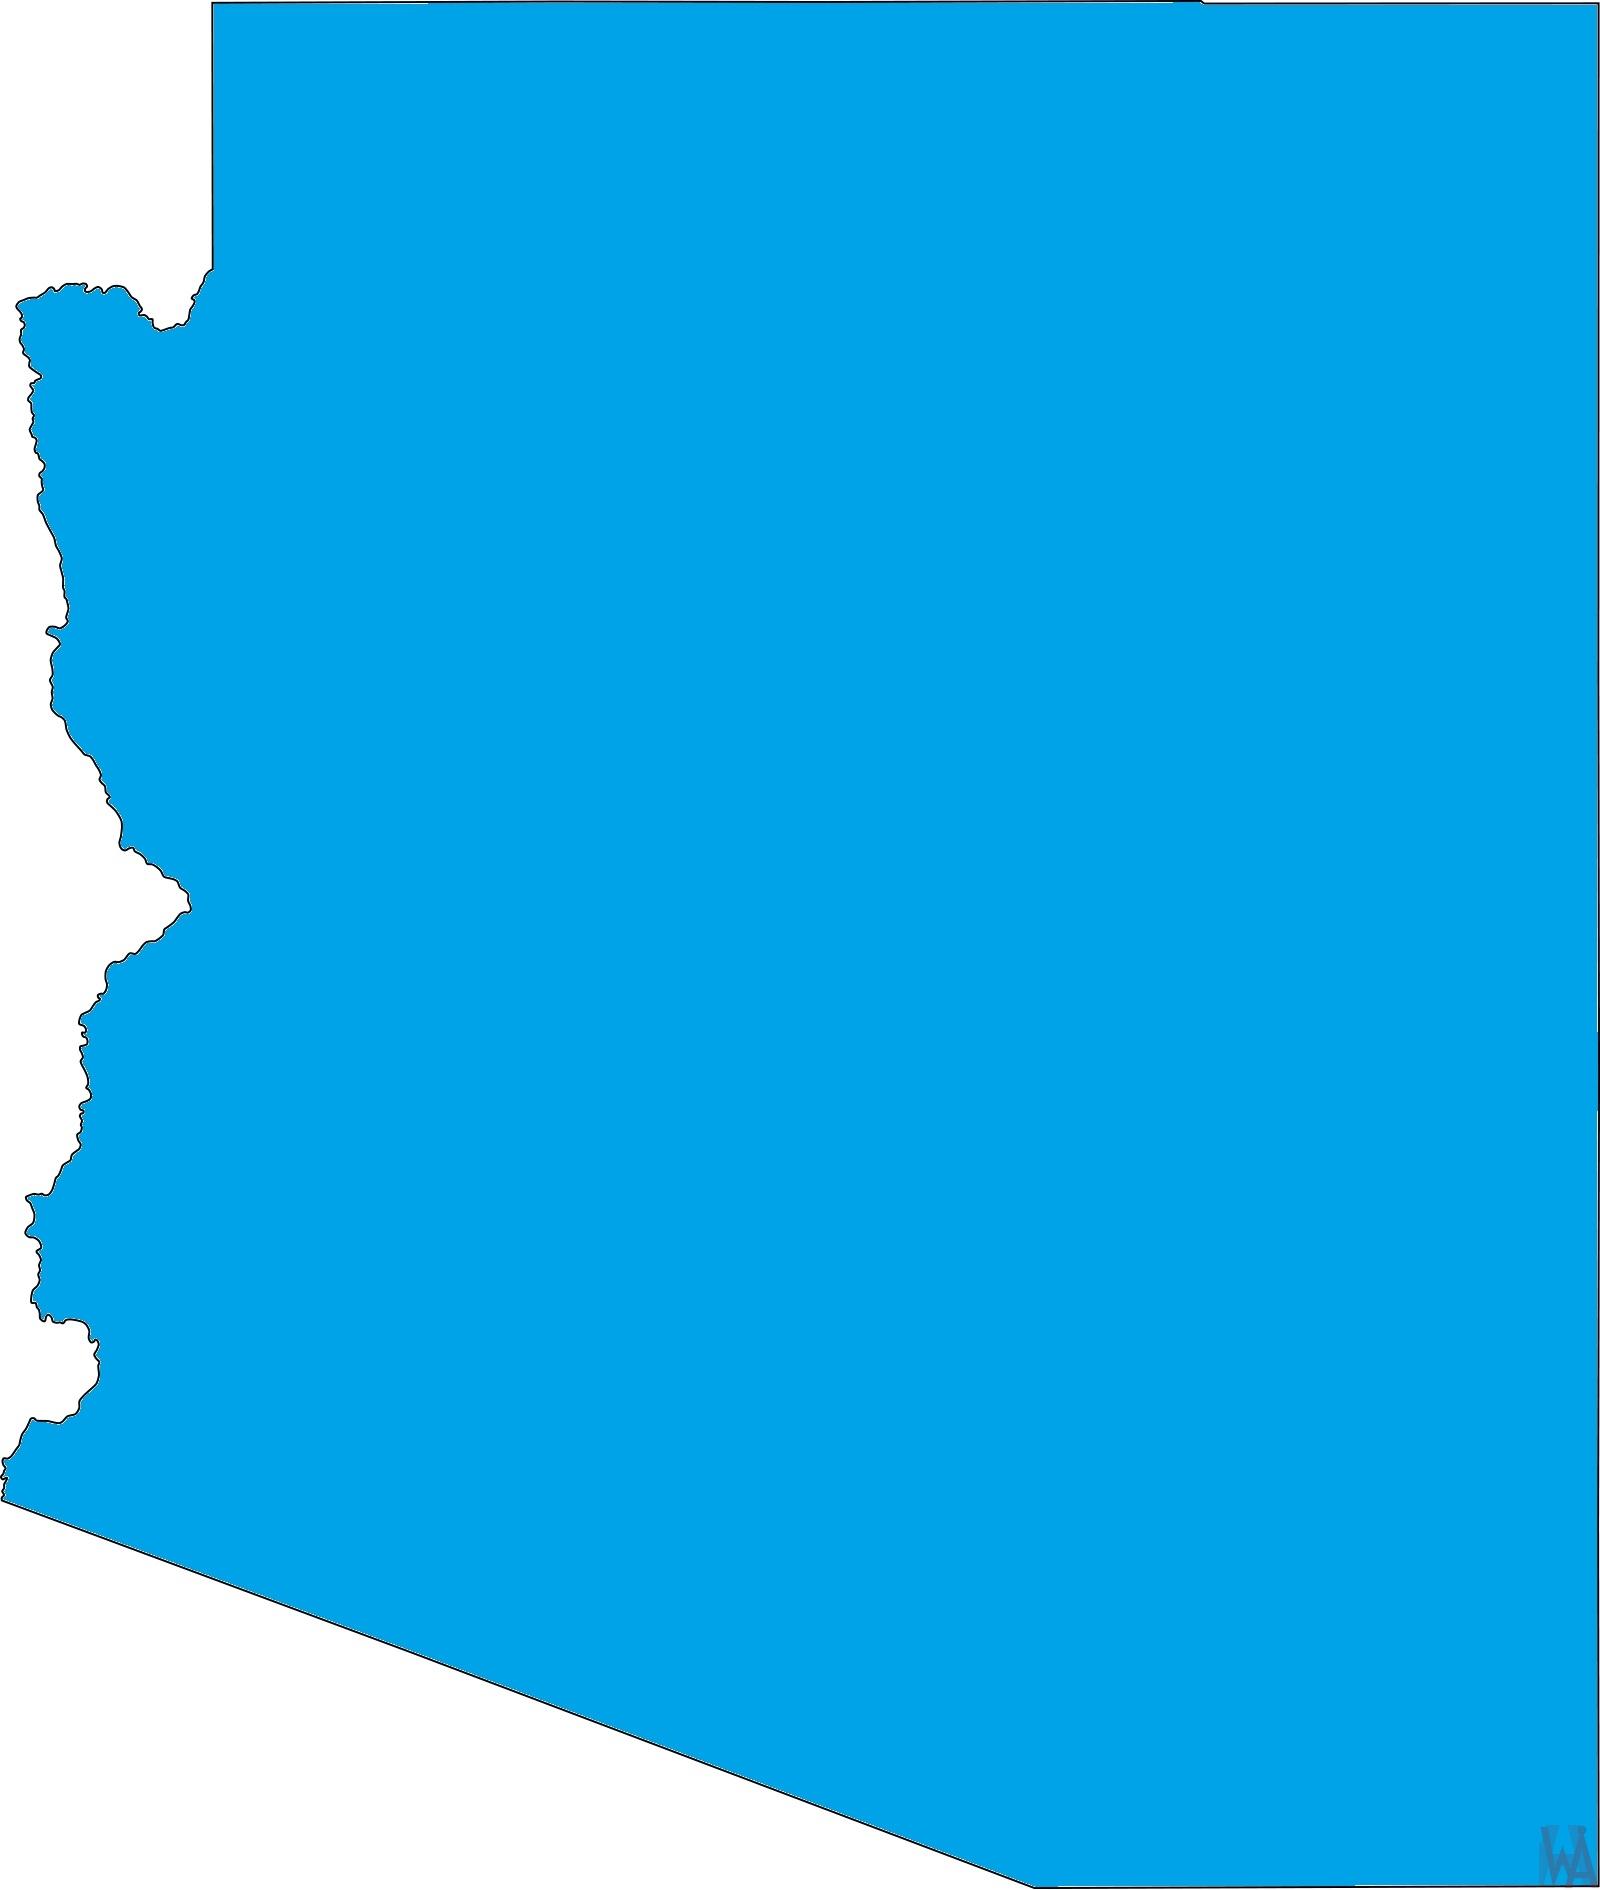 Arizona Blank Outline Map    Blank Outline Map of Arizona – 1